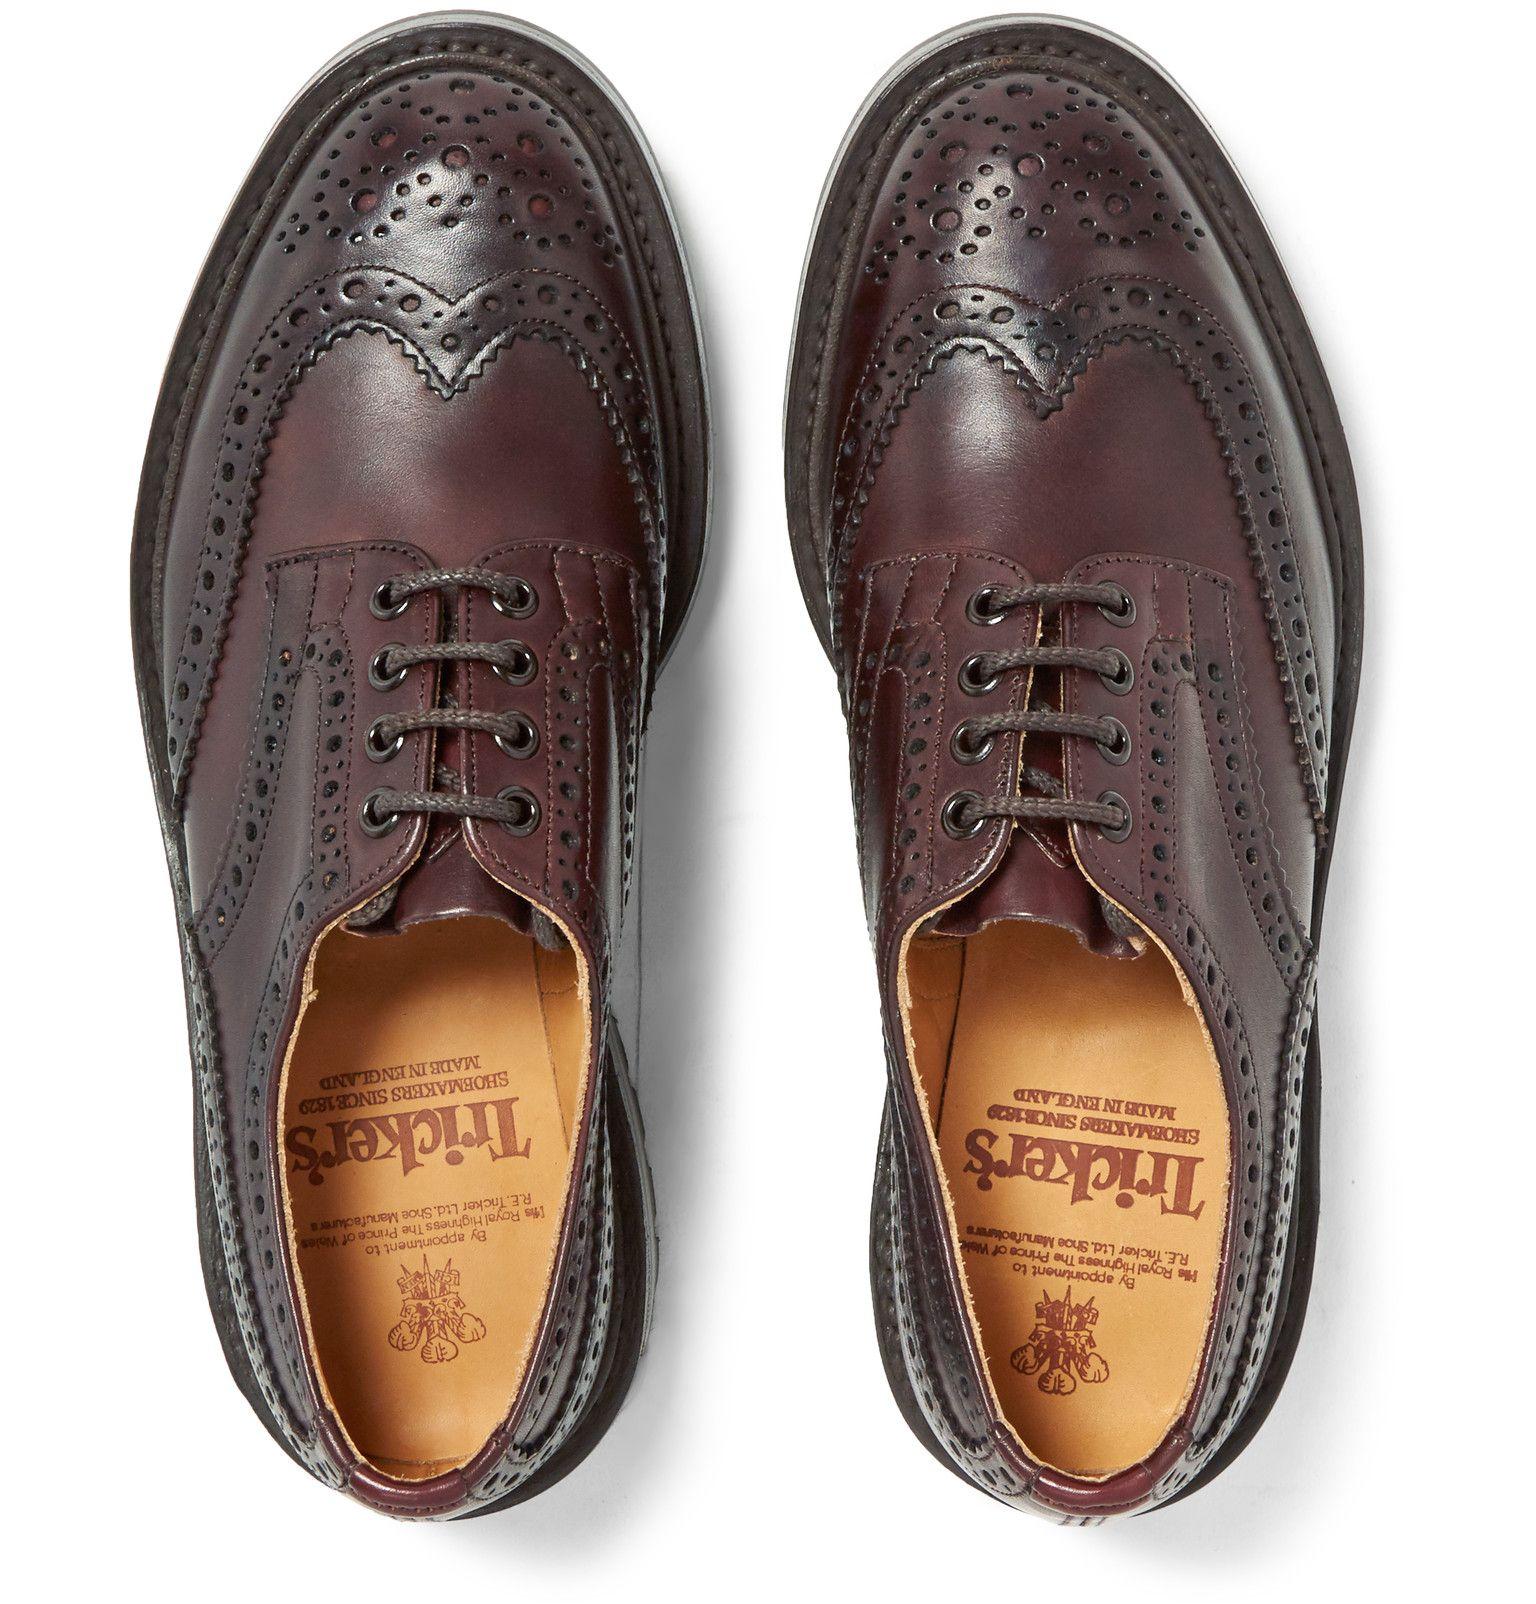 92970a70 TRICKER'S Bourton Leather Wingtip Brogues Horma, Zapatos De Vestir, Botas,  Unico, Moda